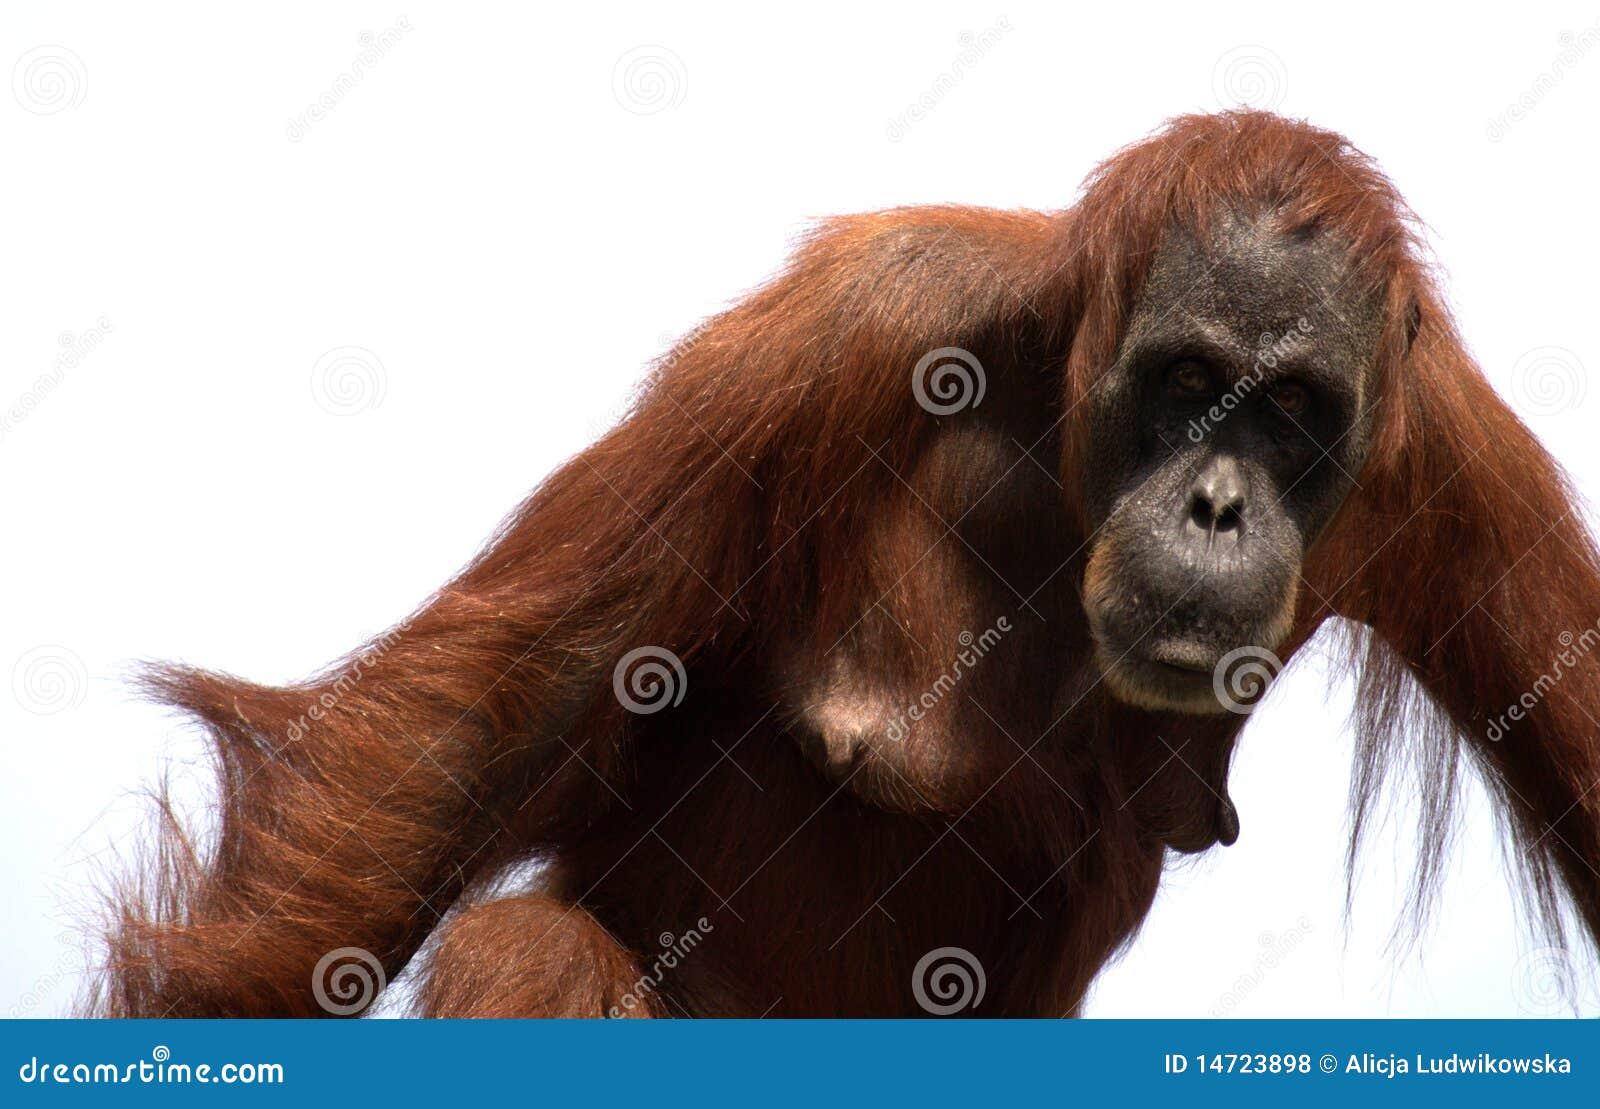 Orangotango do sumatran, macaco